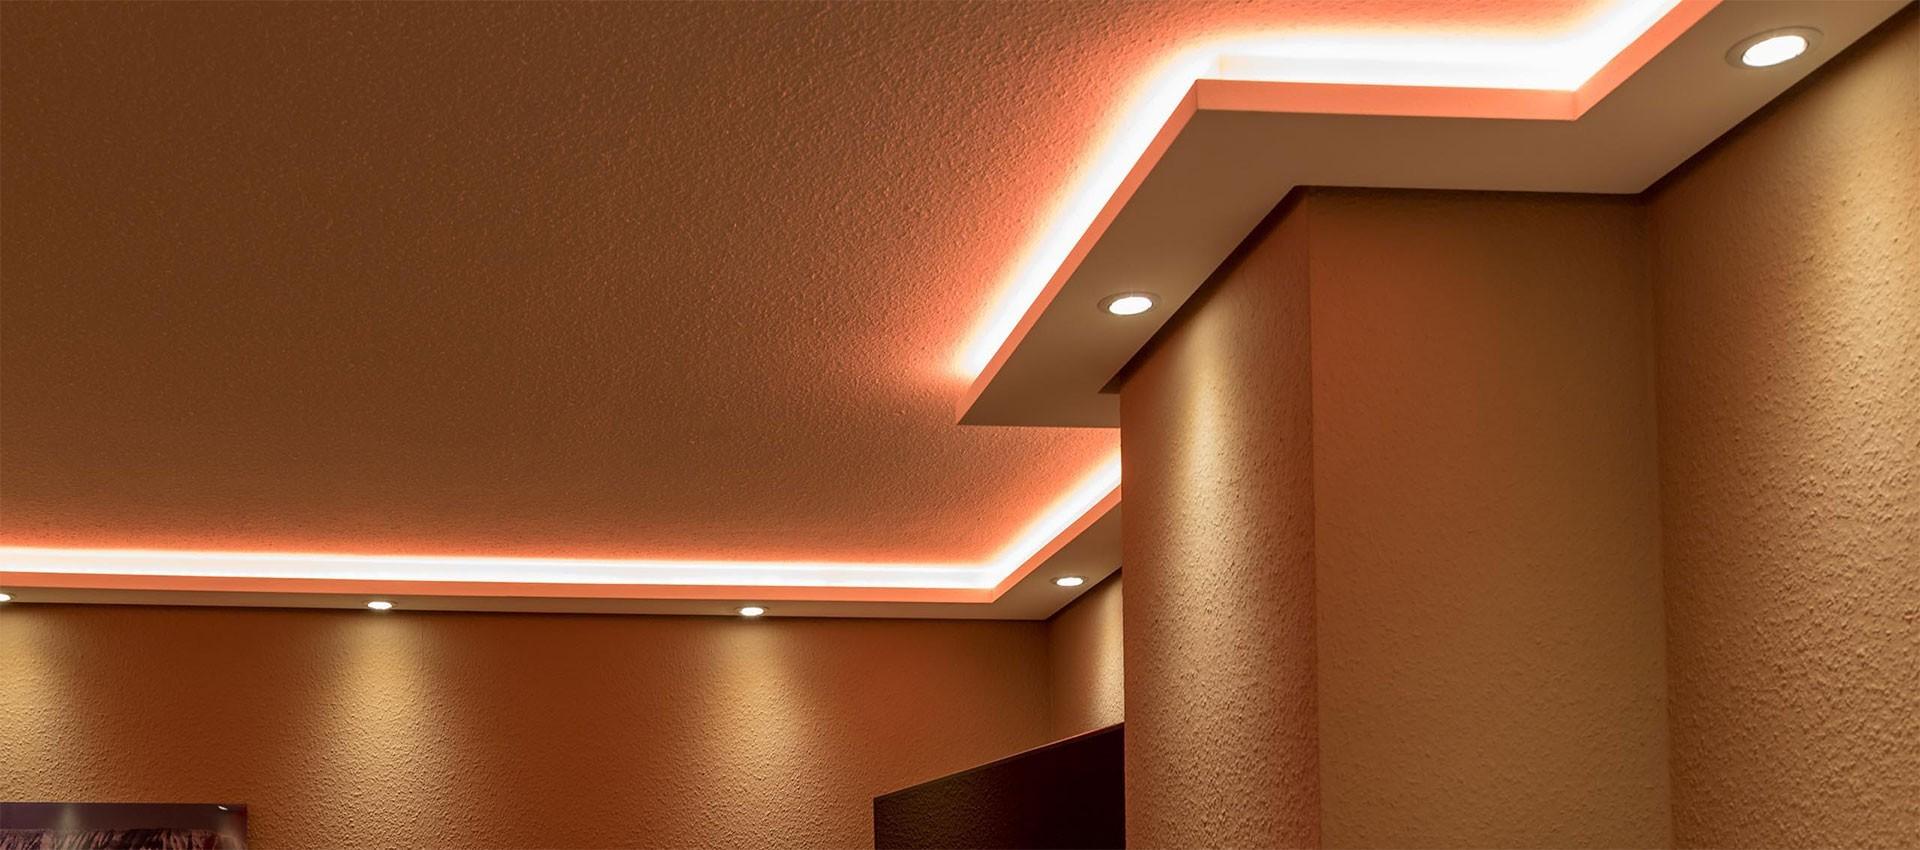 Indirekte Beleuchtung Led Dimmbar | Indirekte Beleuchtung Led Stuckleisten Und Fassadengestaltung